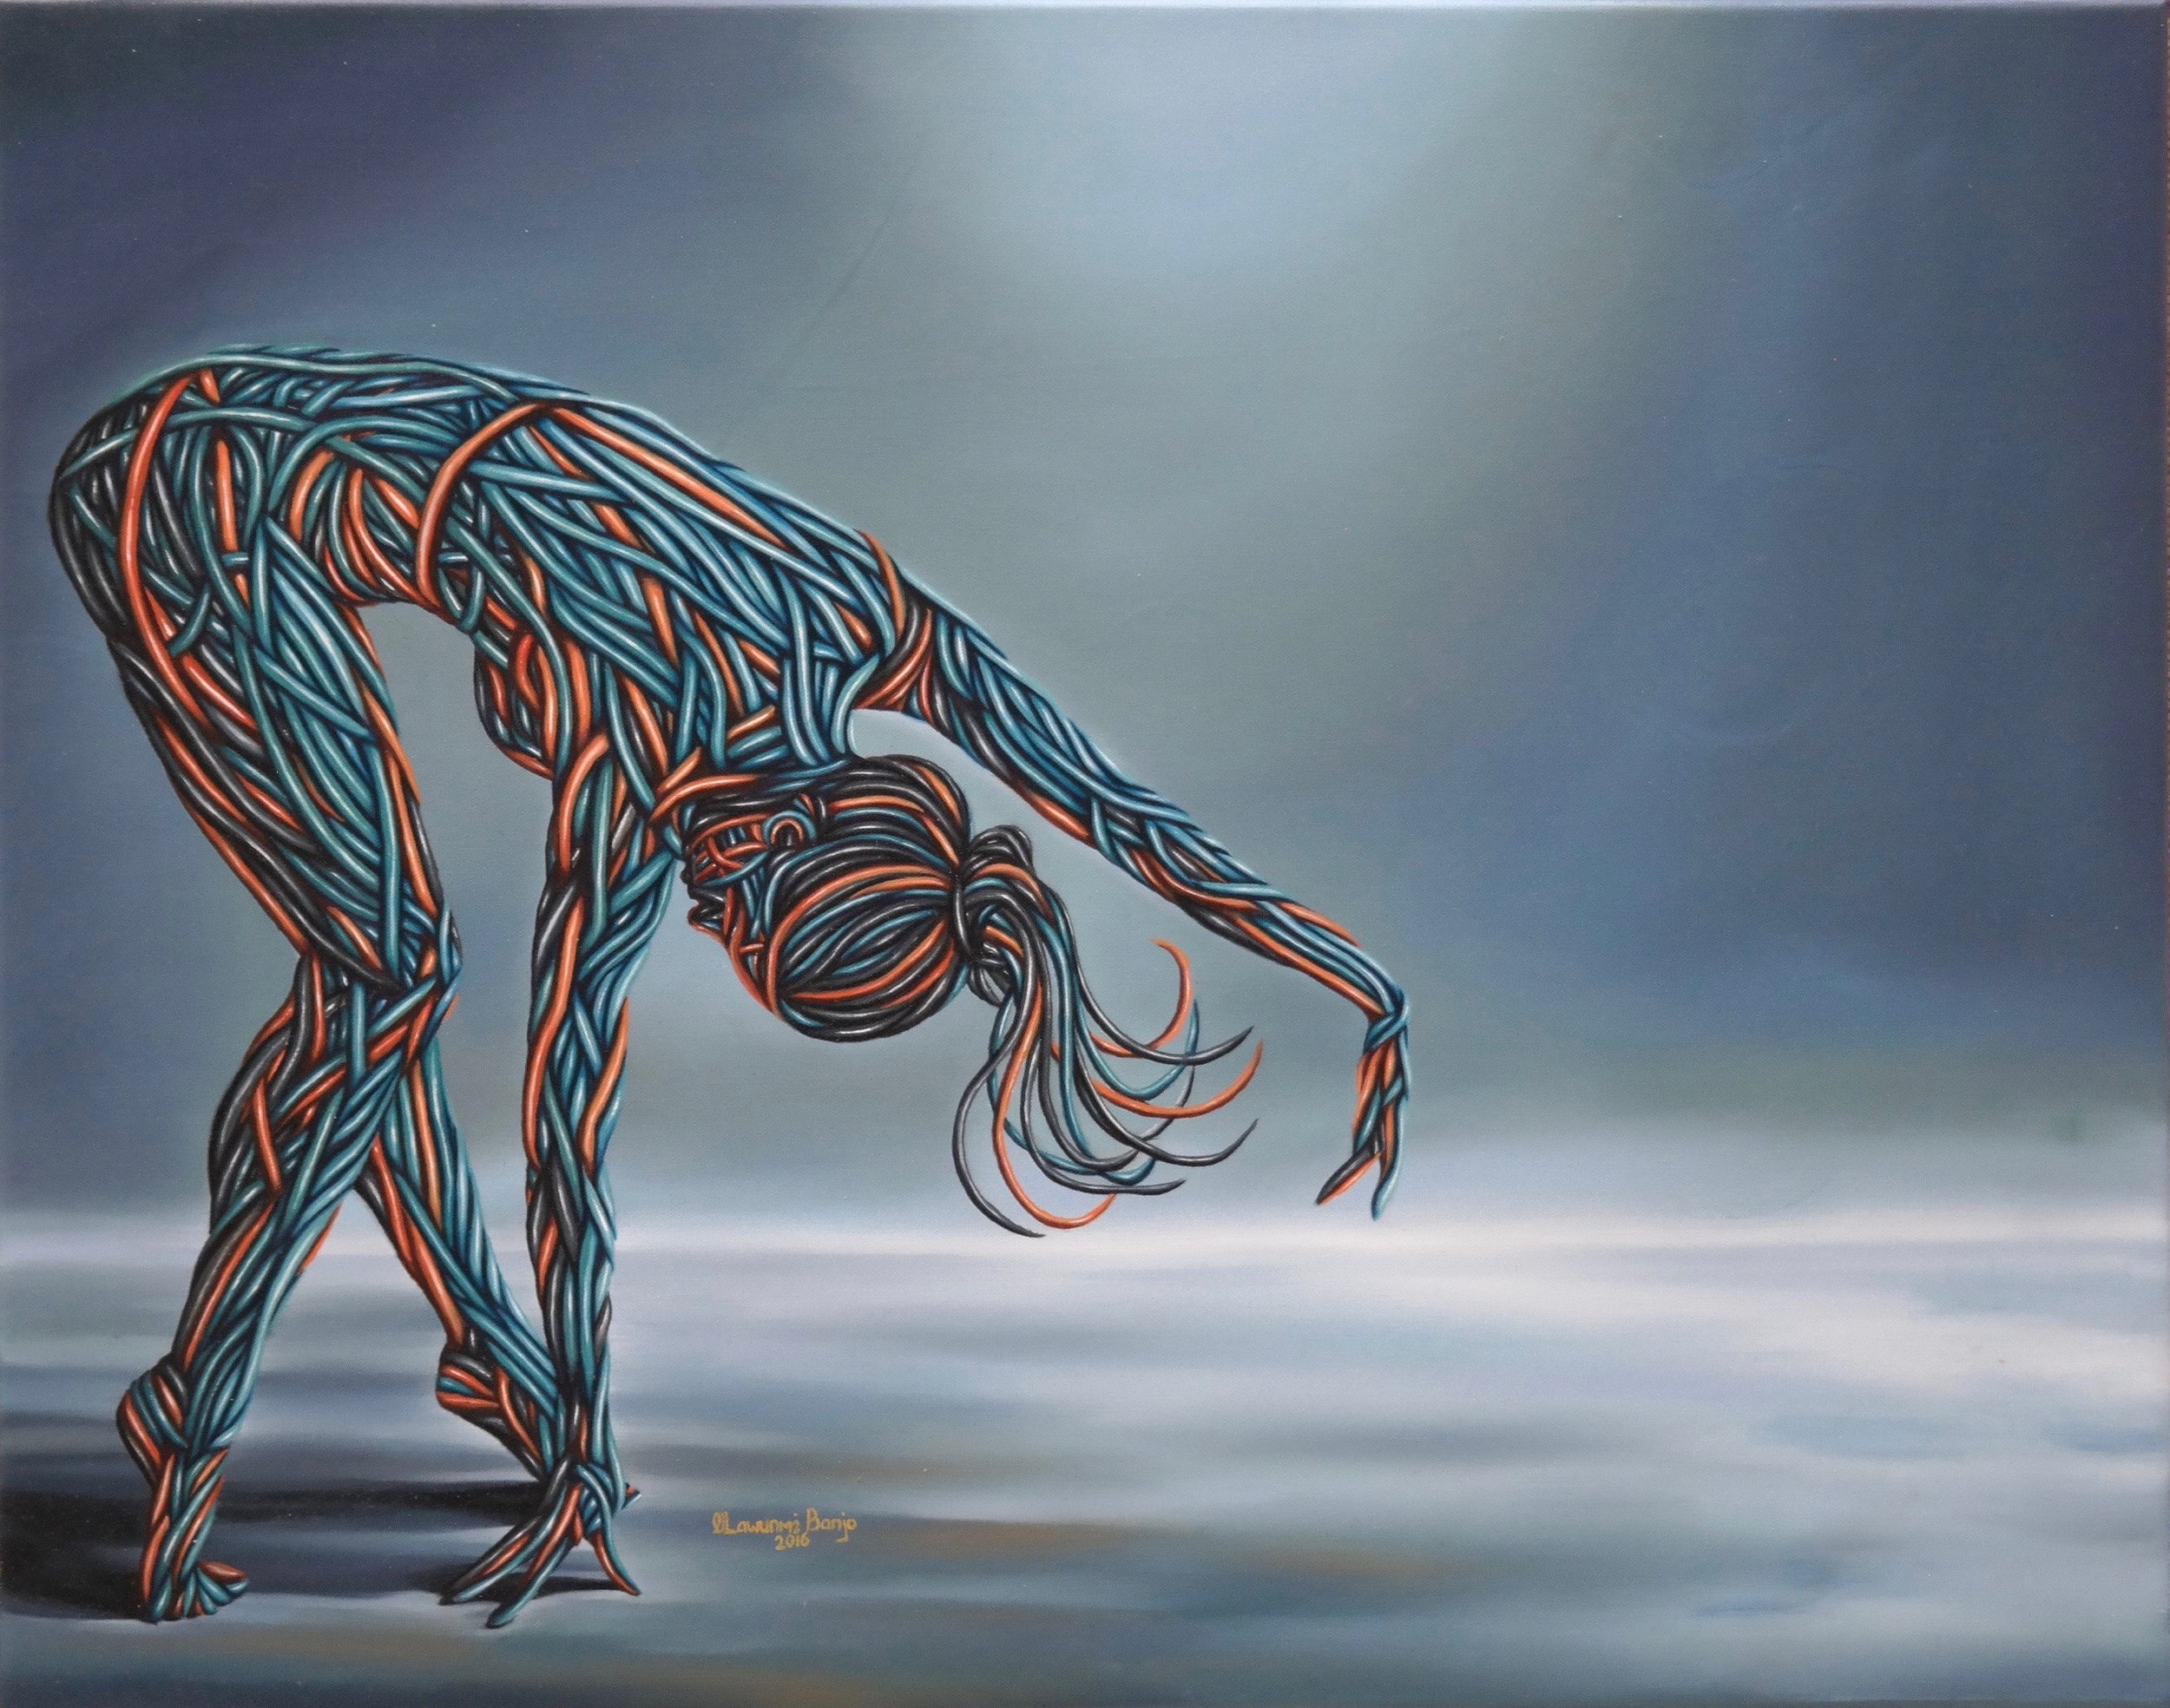 Sway, Oil on canvas, 56 x 71 cm, 2016, Olawunmi Banjo